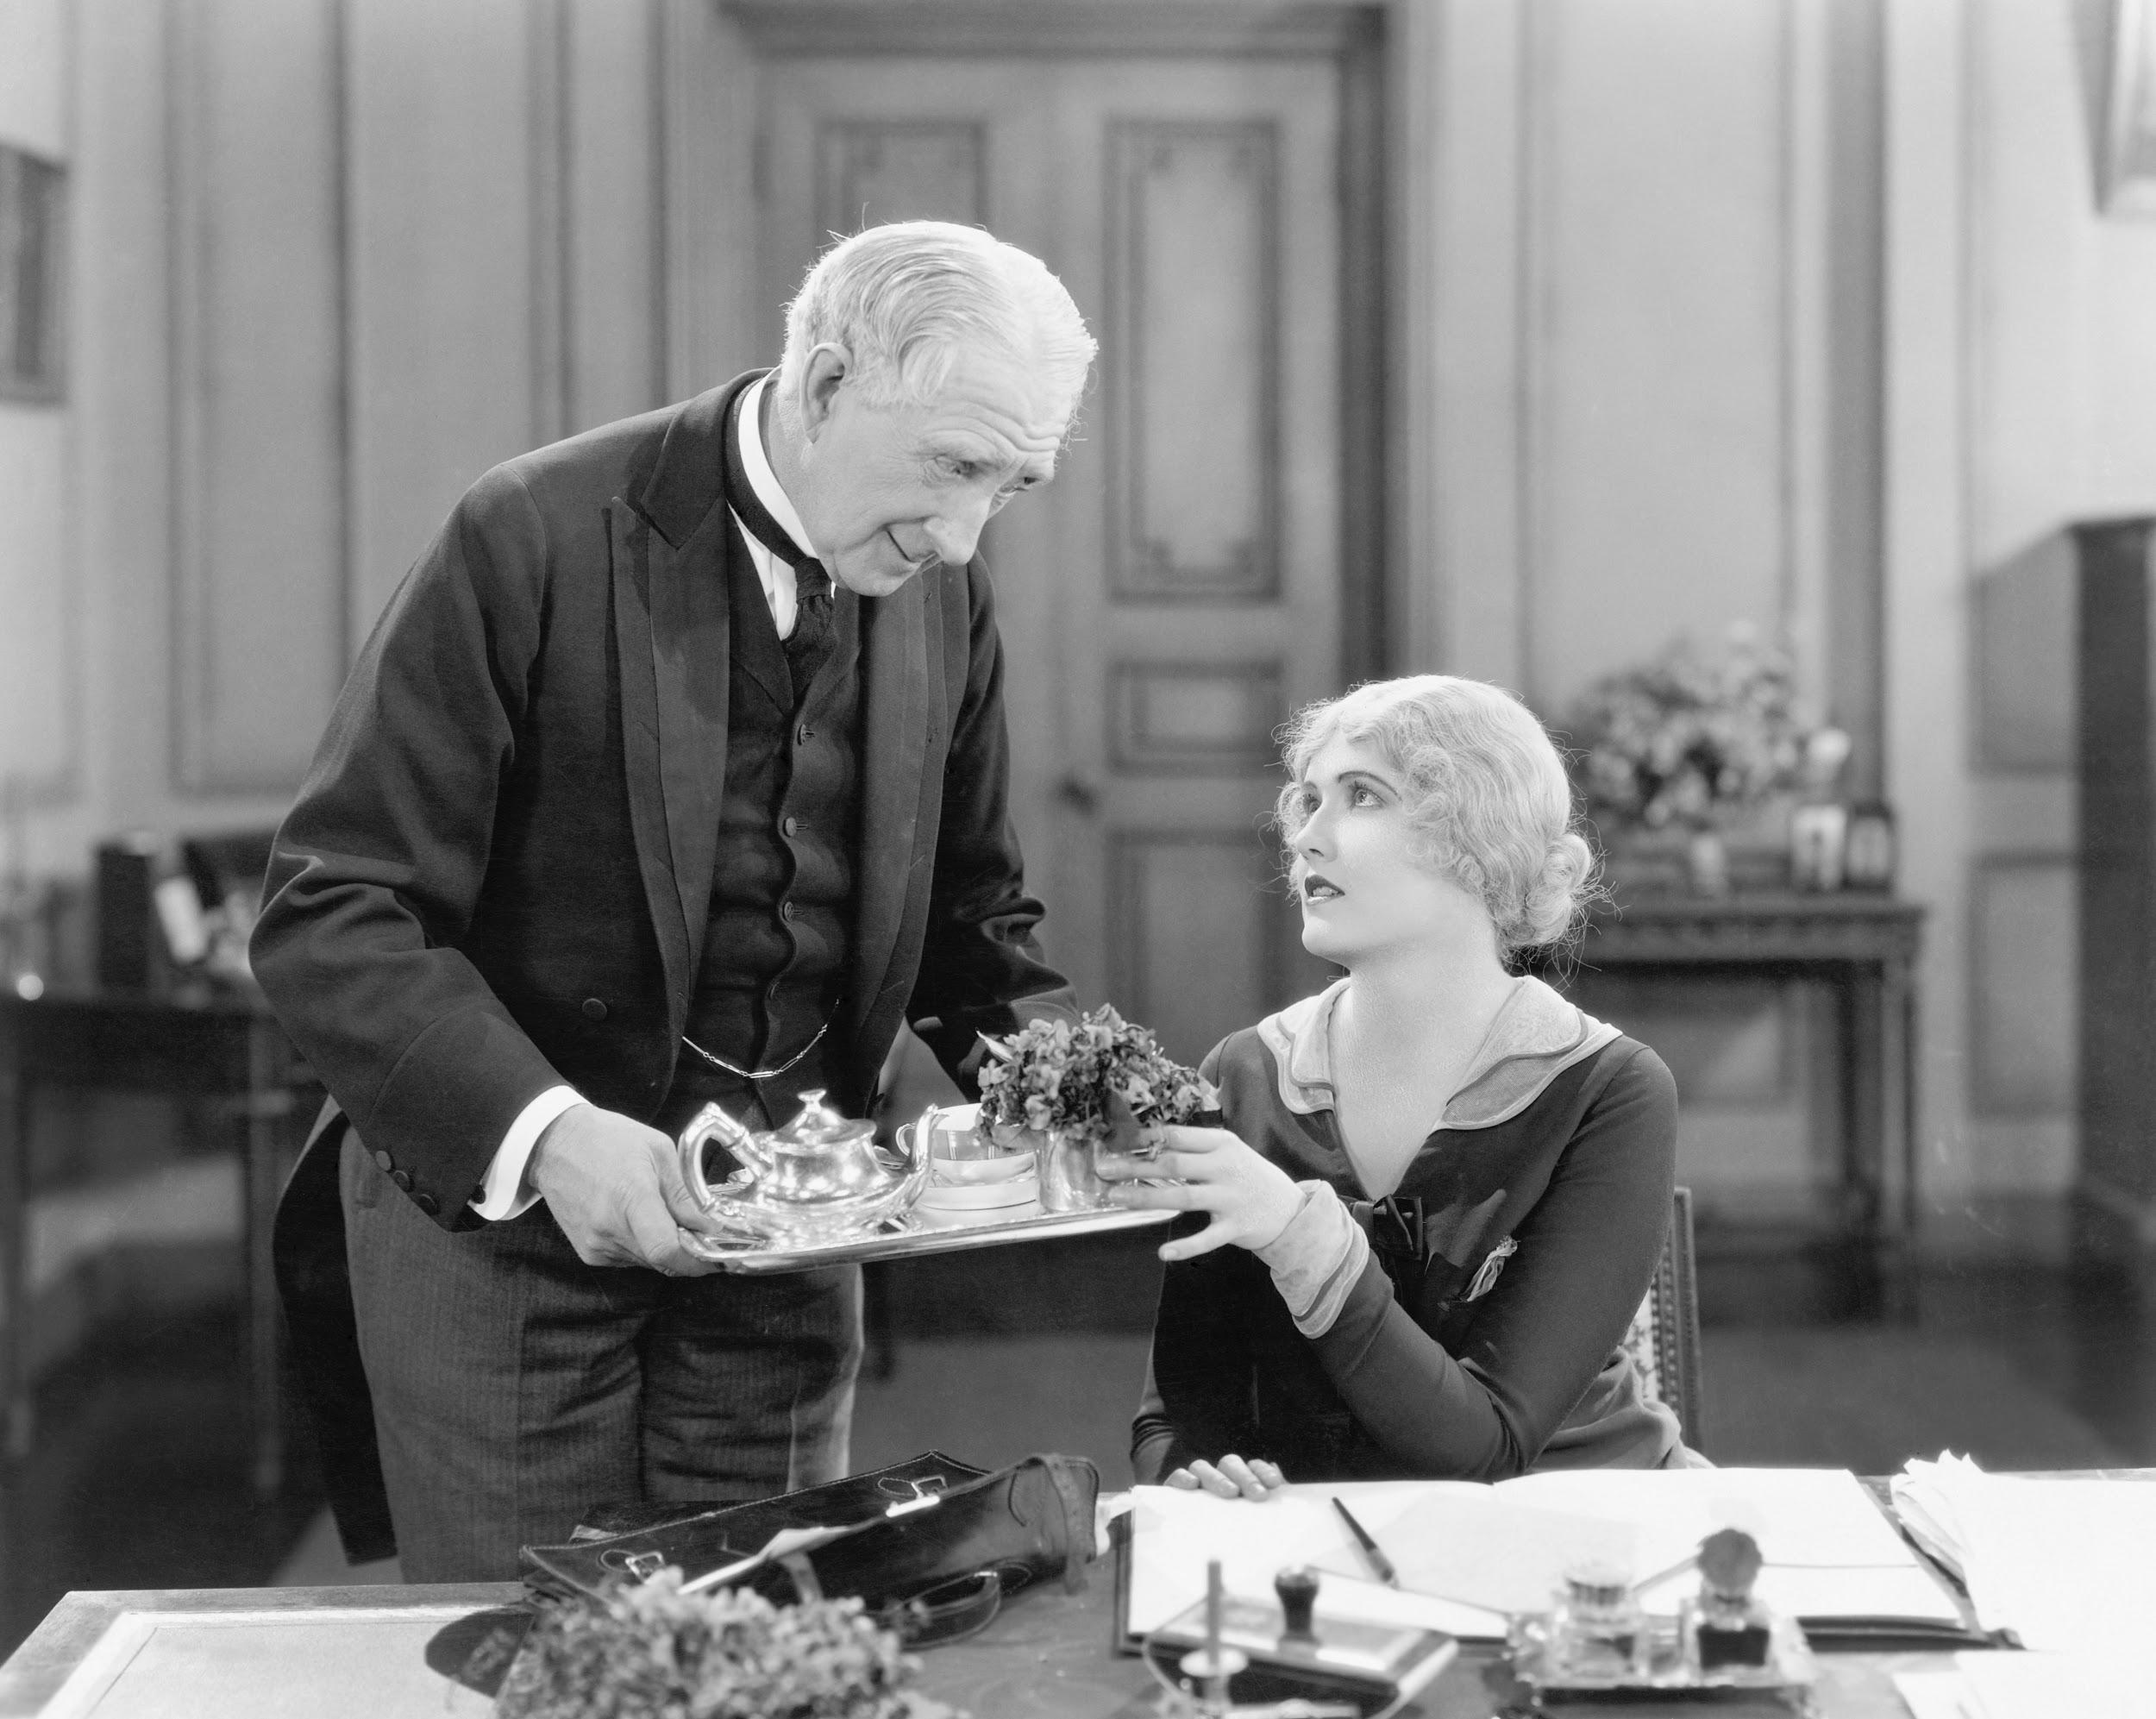 Older man serving a woman tea on a tray